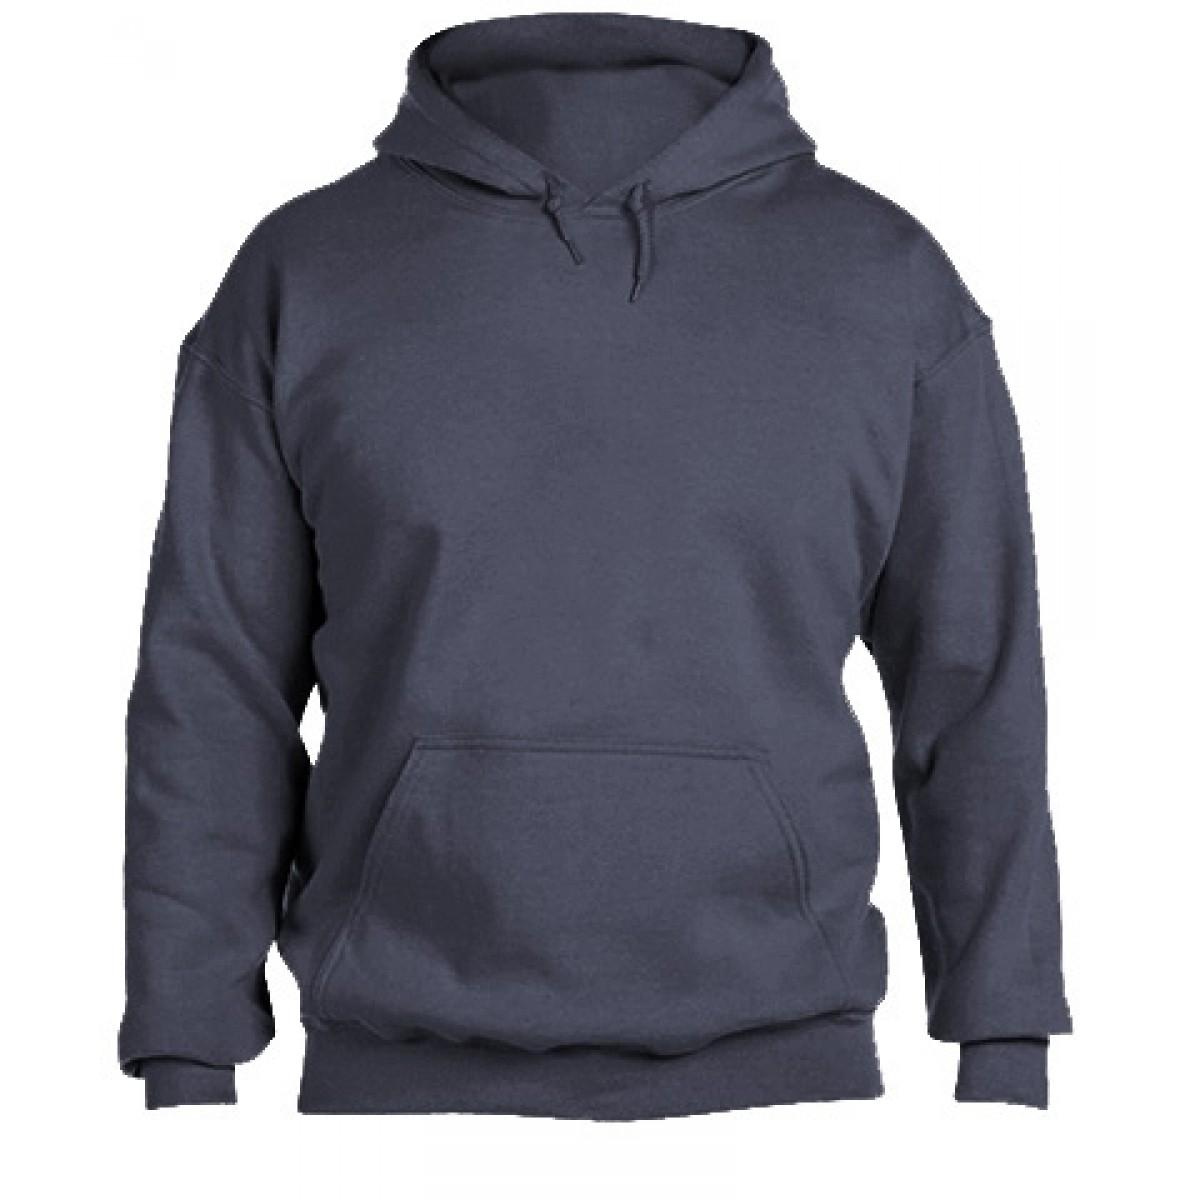 Solid Hooded Sweatshirt  50/50 Heavy Blend-Heather Navy-M